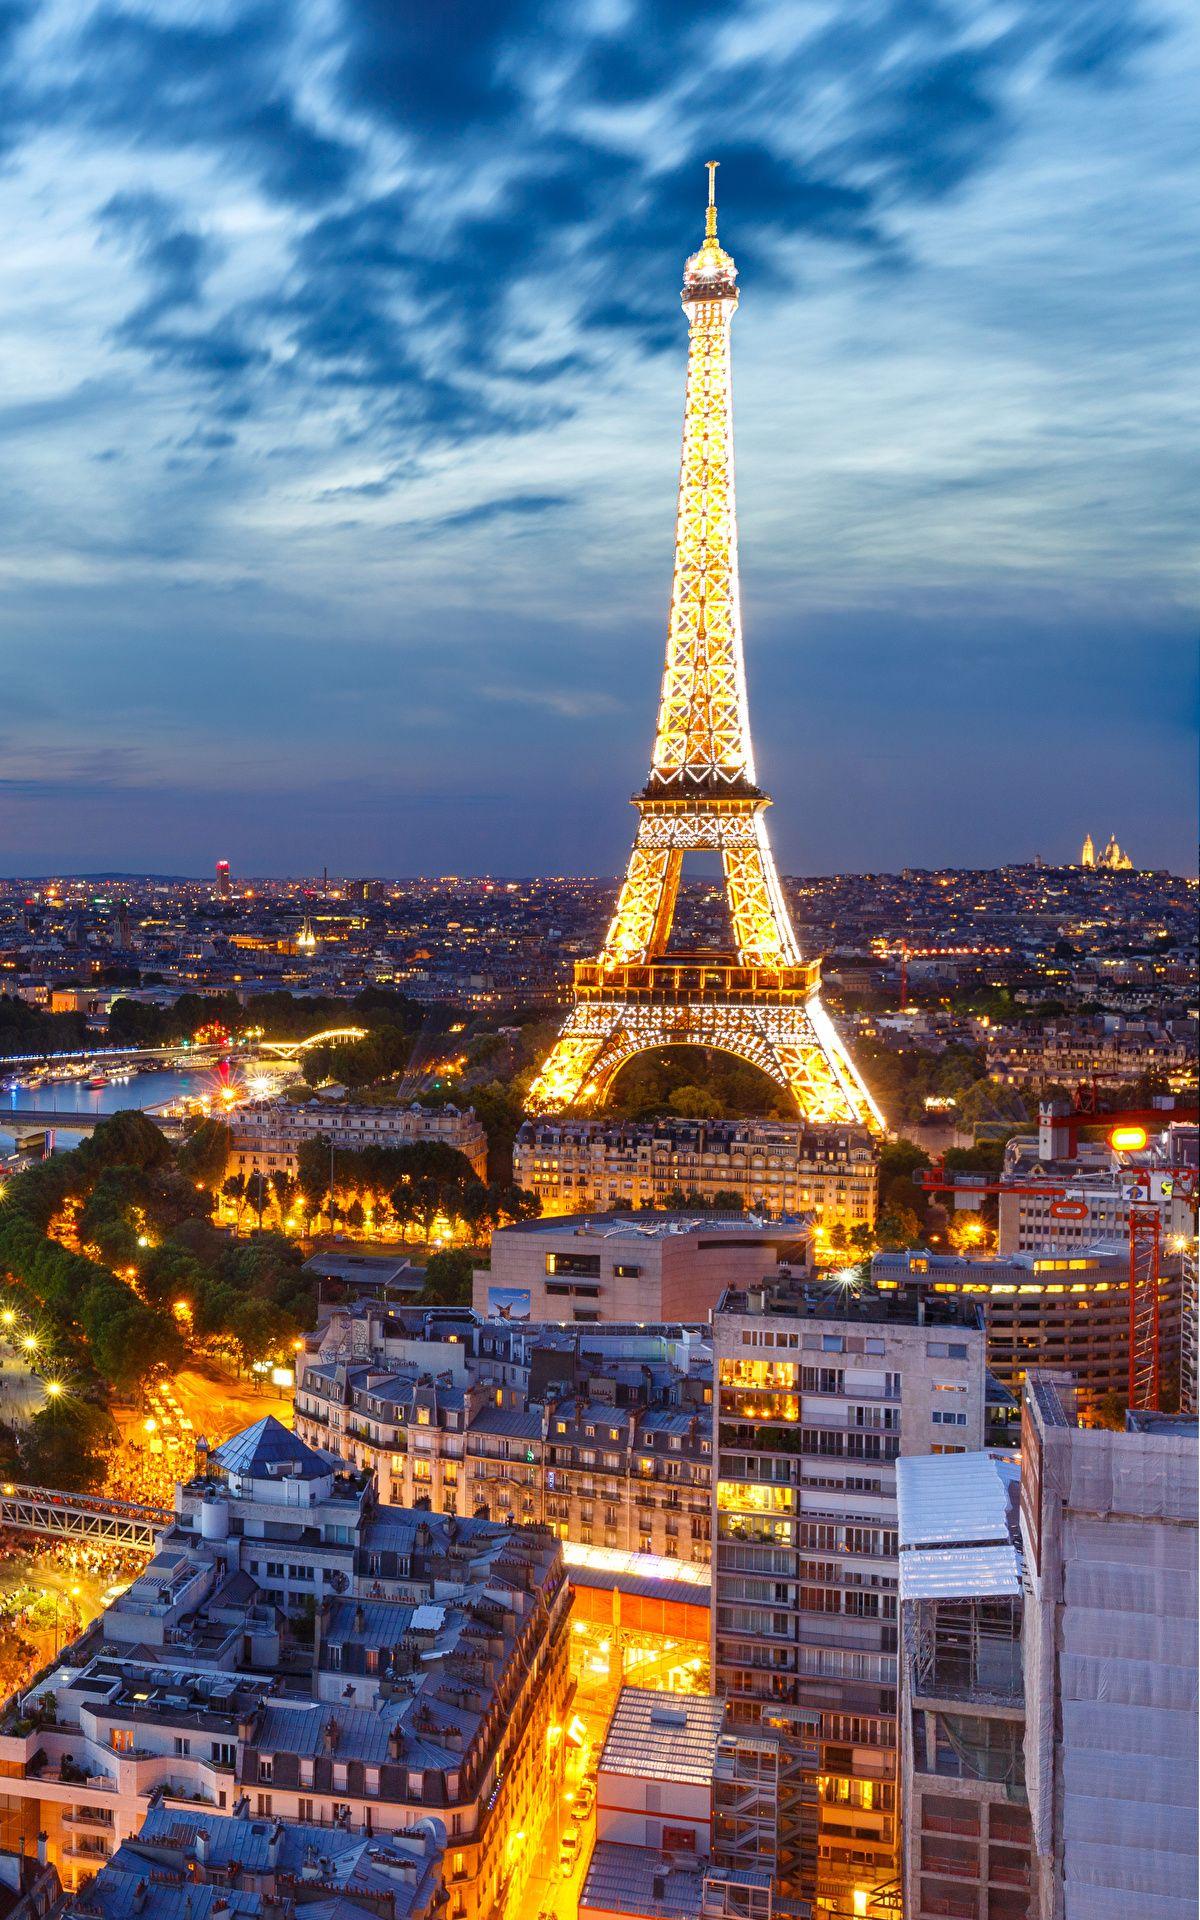 Portrait Wallpaper X Hd Best Honeymoon Destinations Eiffel Tower At Night Paris At Night